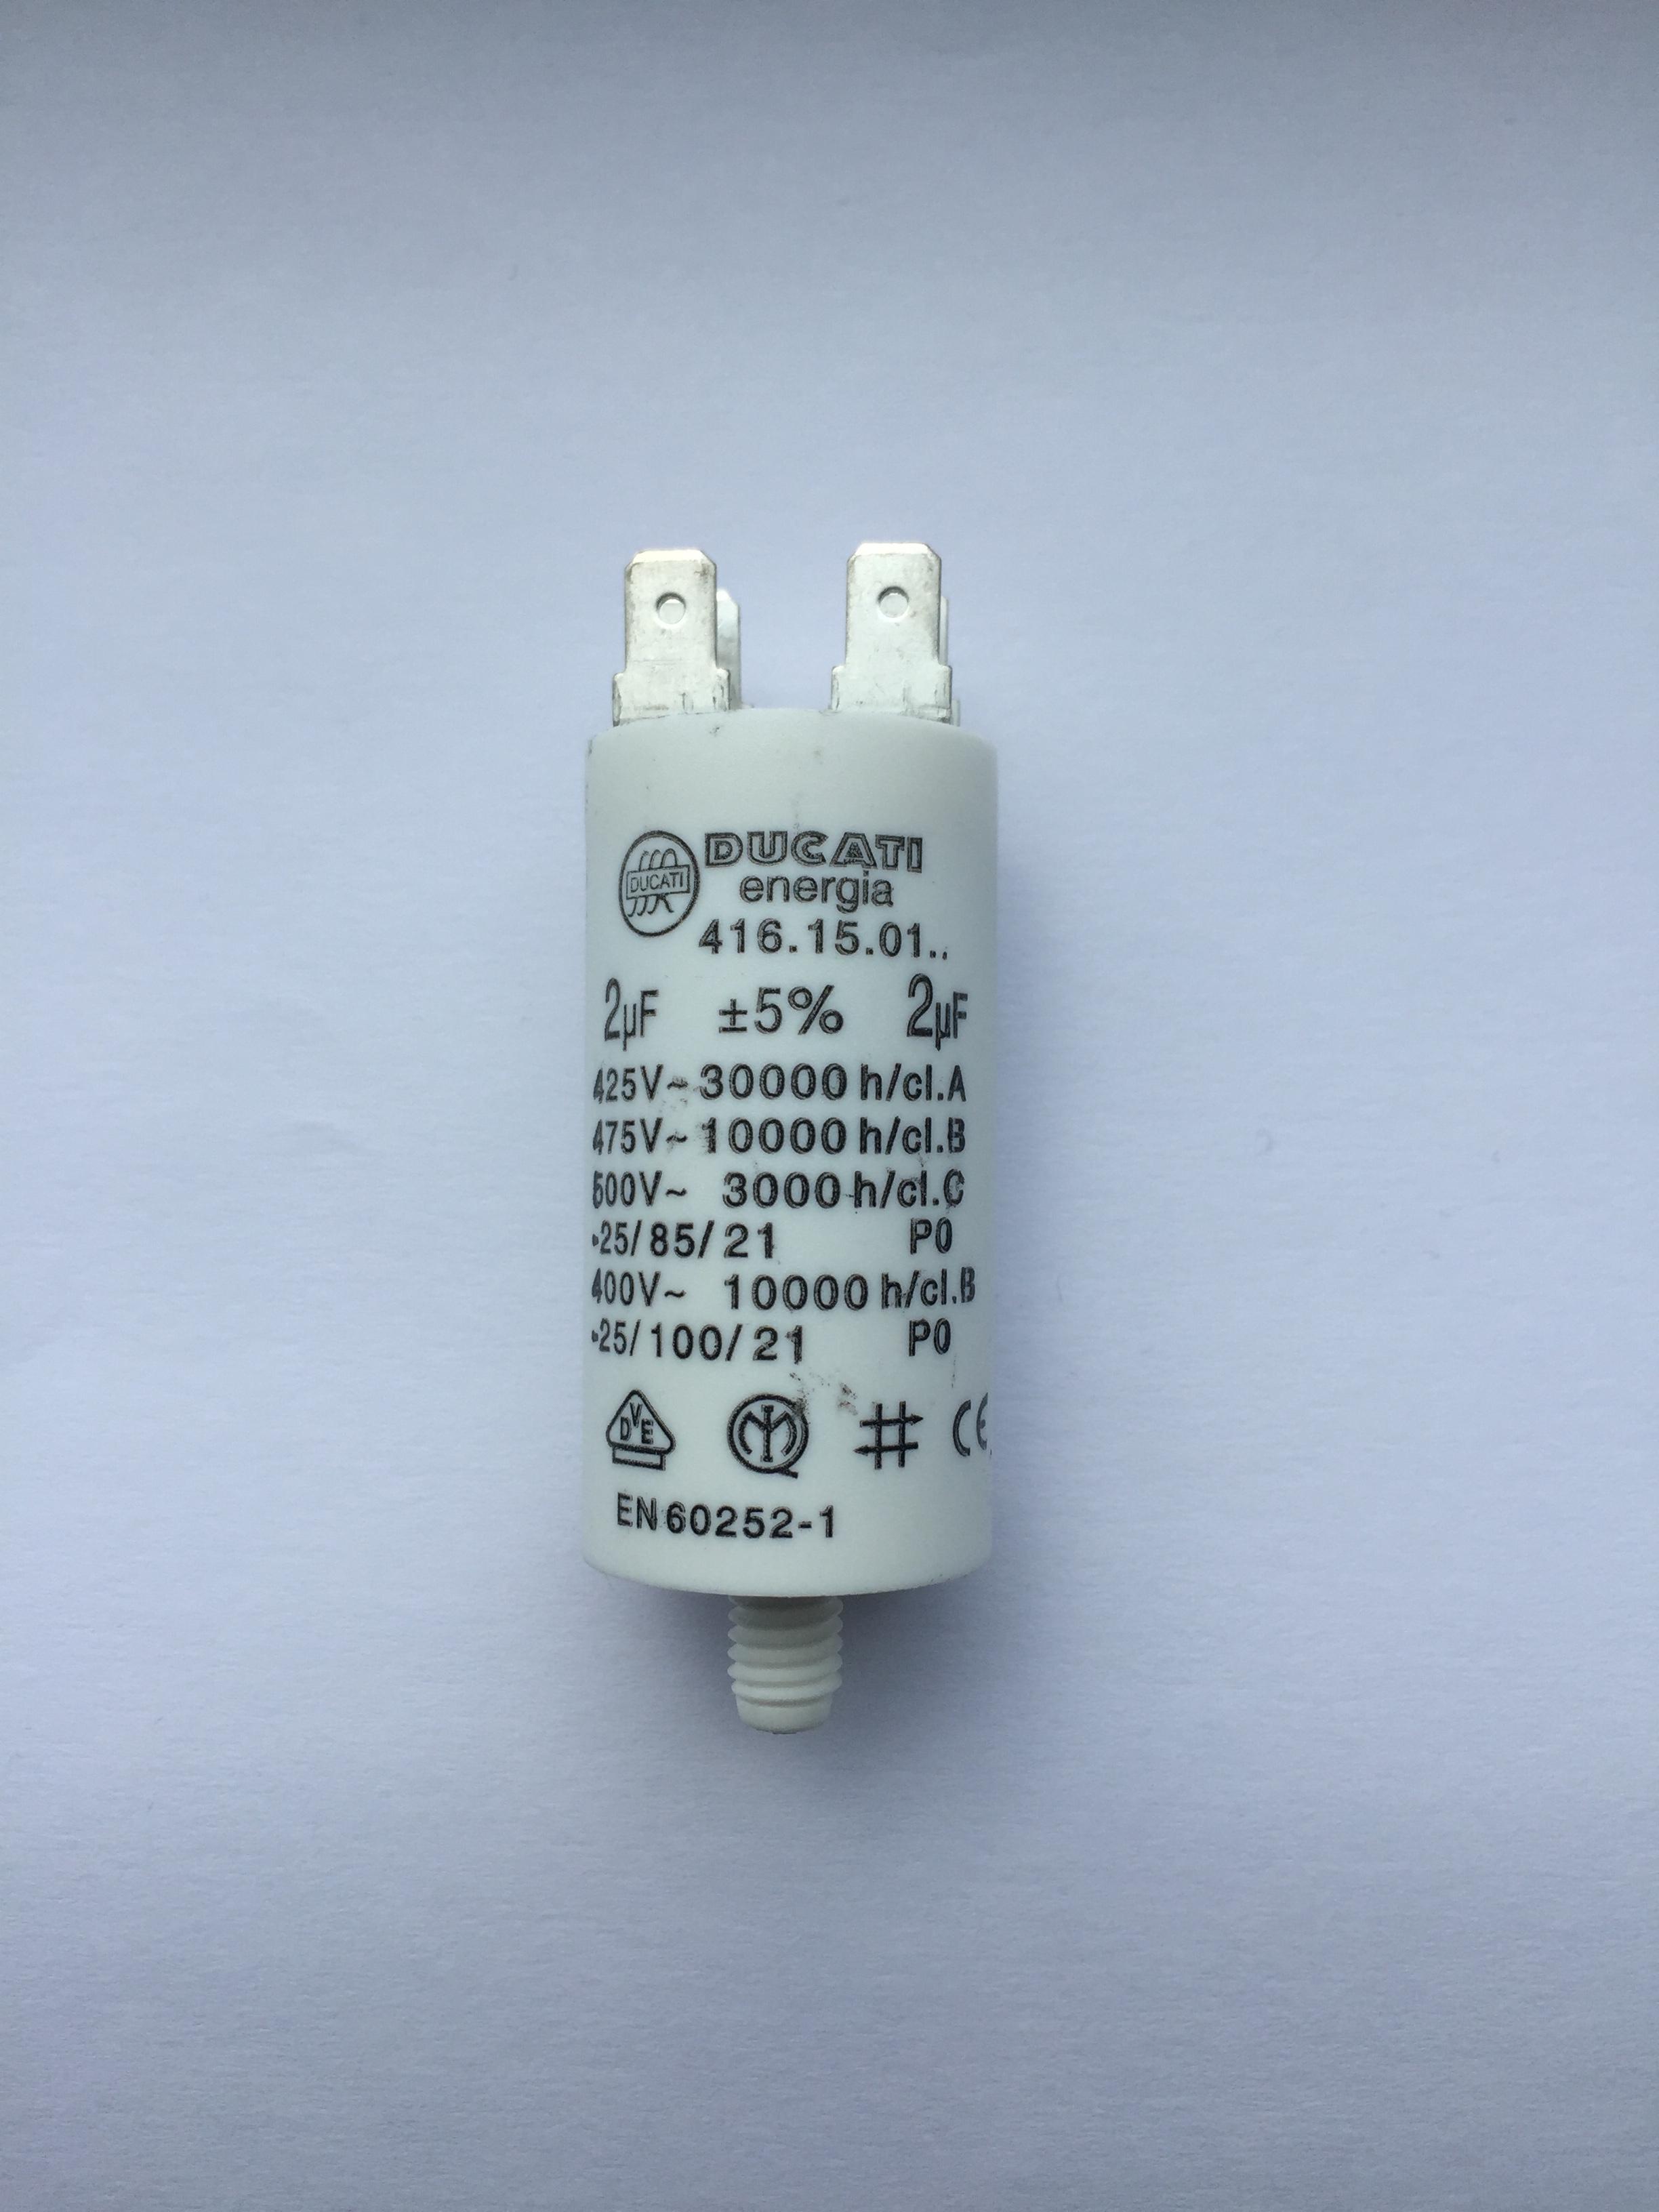 Buy motor run capacitors 2uf buy now get next day delivery for Ducati energia motor run capacitor